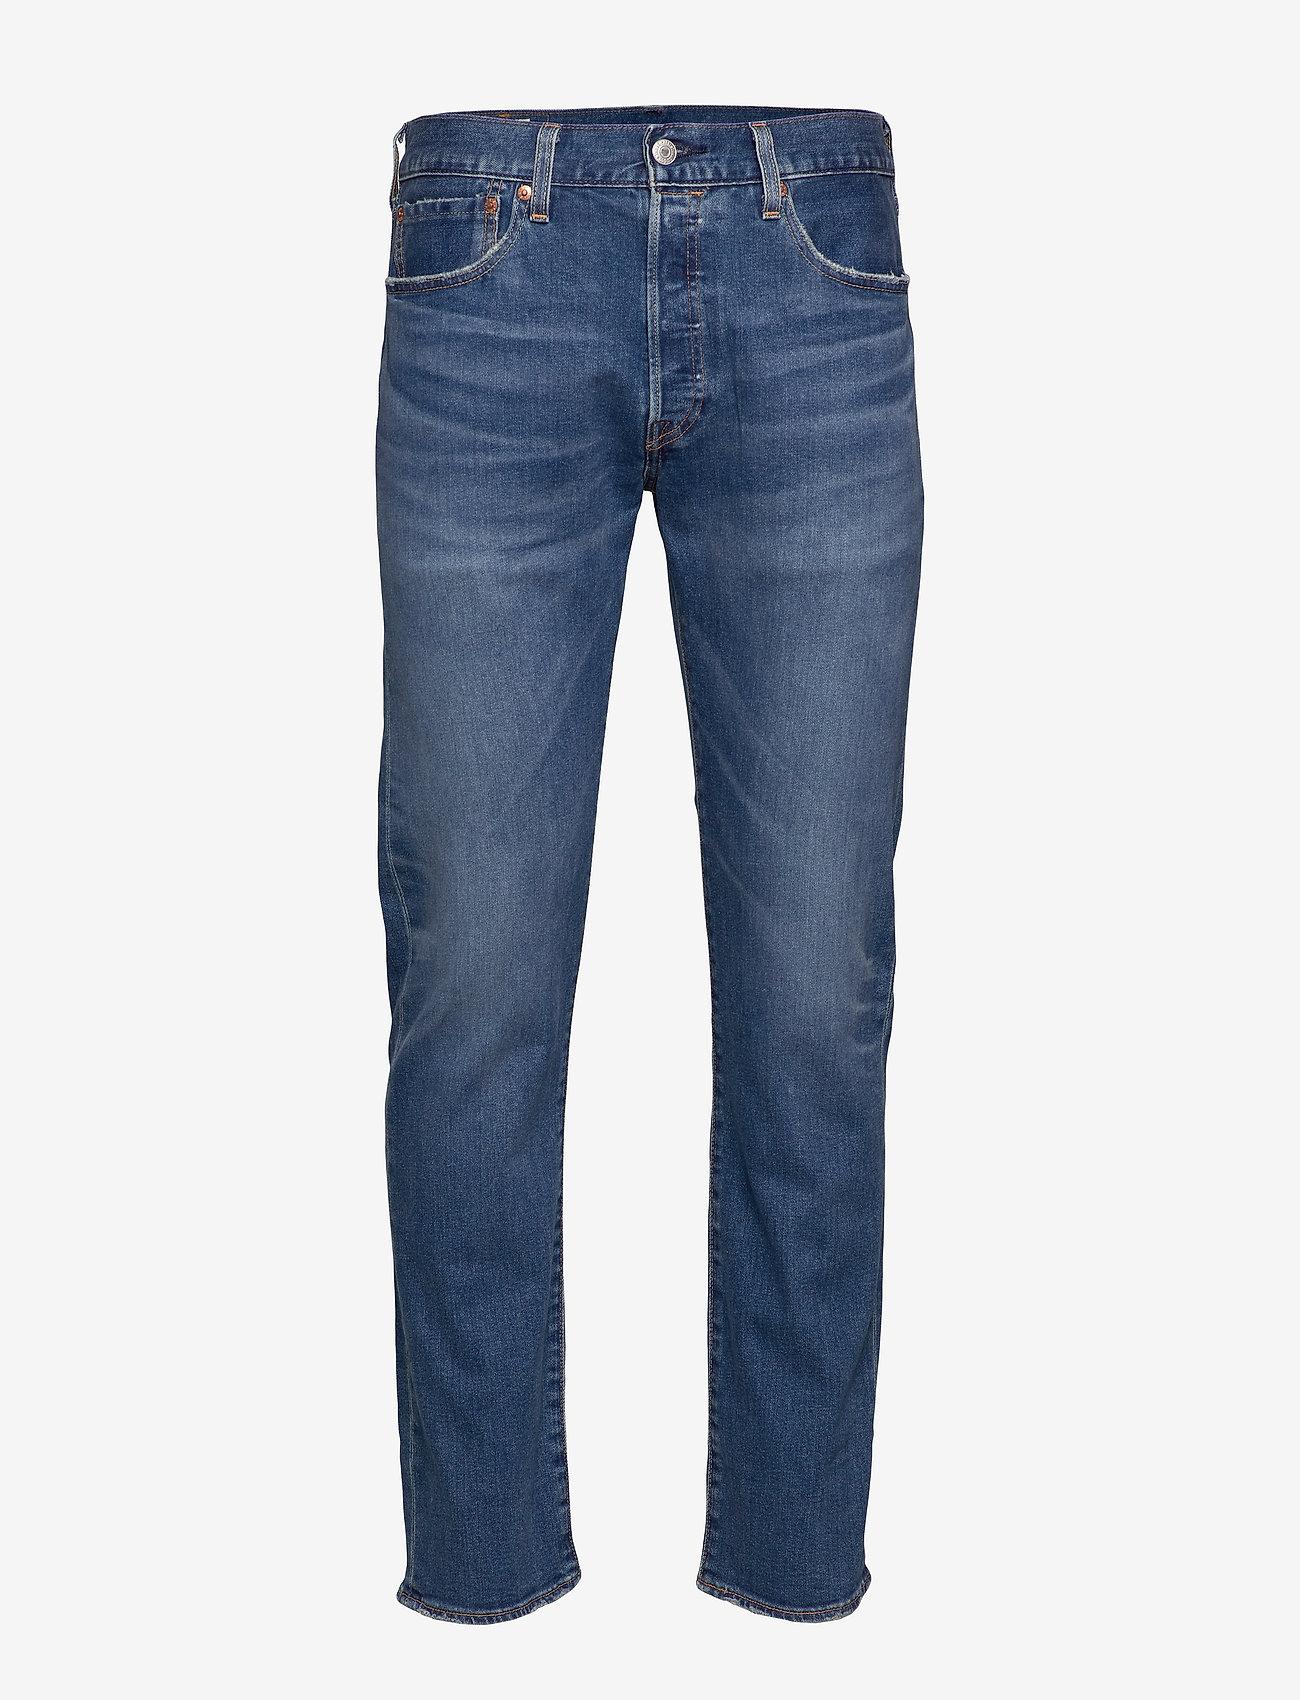 LEVI´S Men - 501 LEVISORIGINAL KEY WEST SKY - regular jeans - dark indigo - flat finish - 1